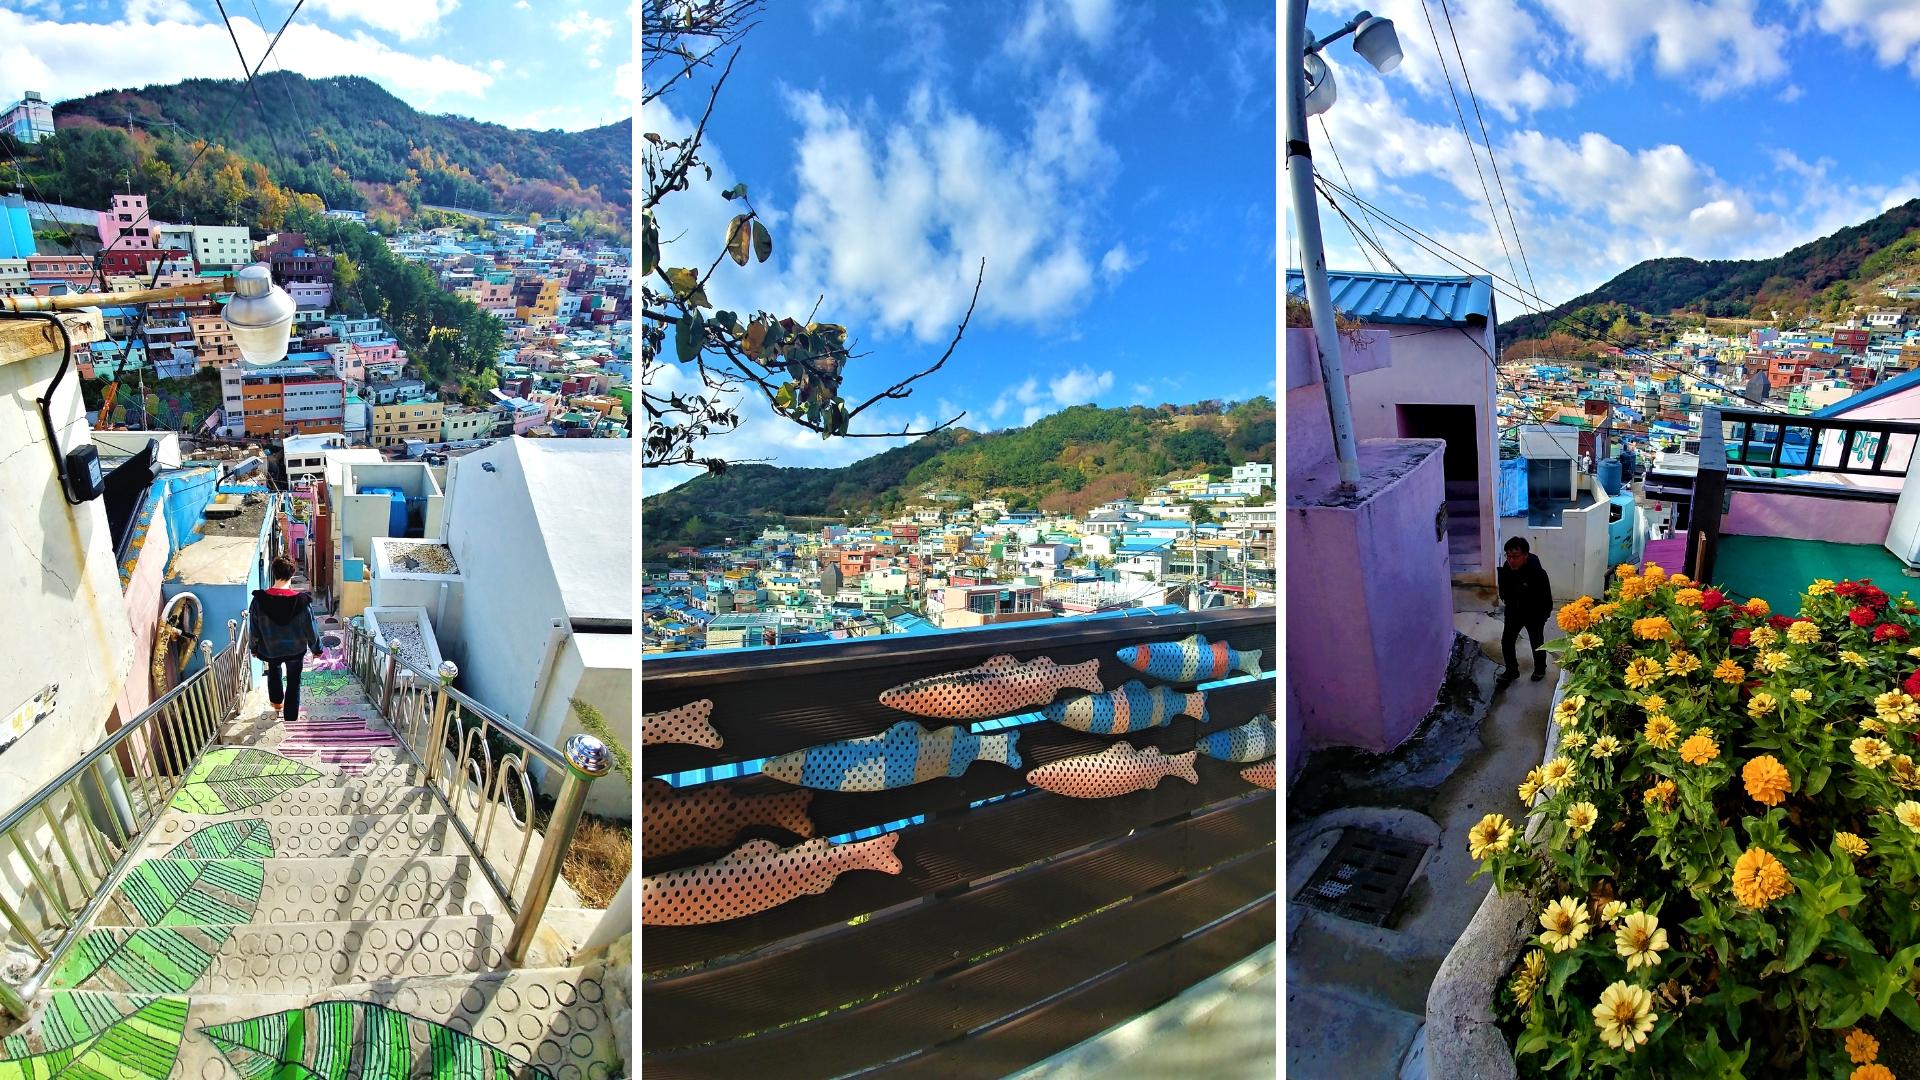 busan gamcheon visite street art blog voyage coree du sud arpenter le chemin